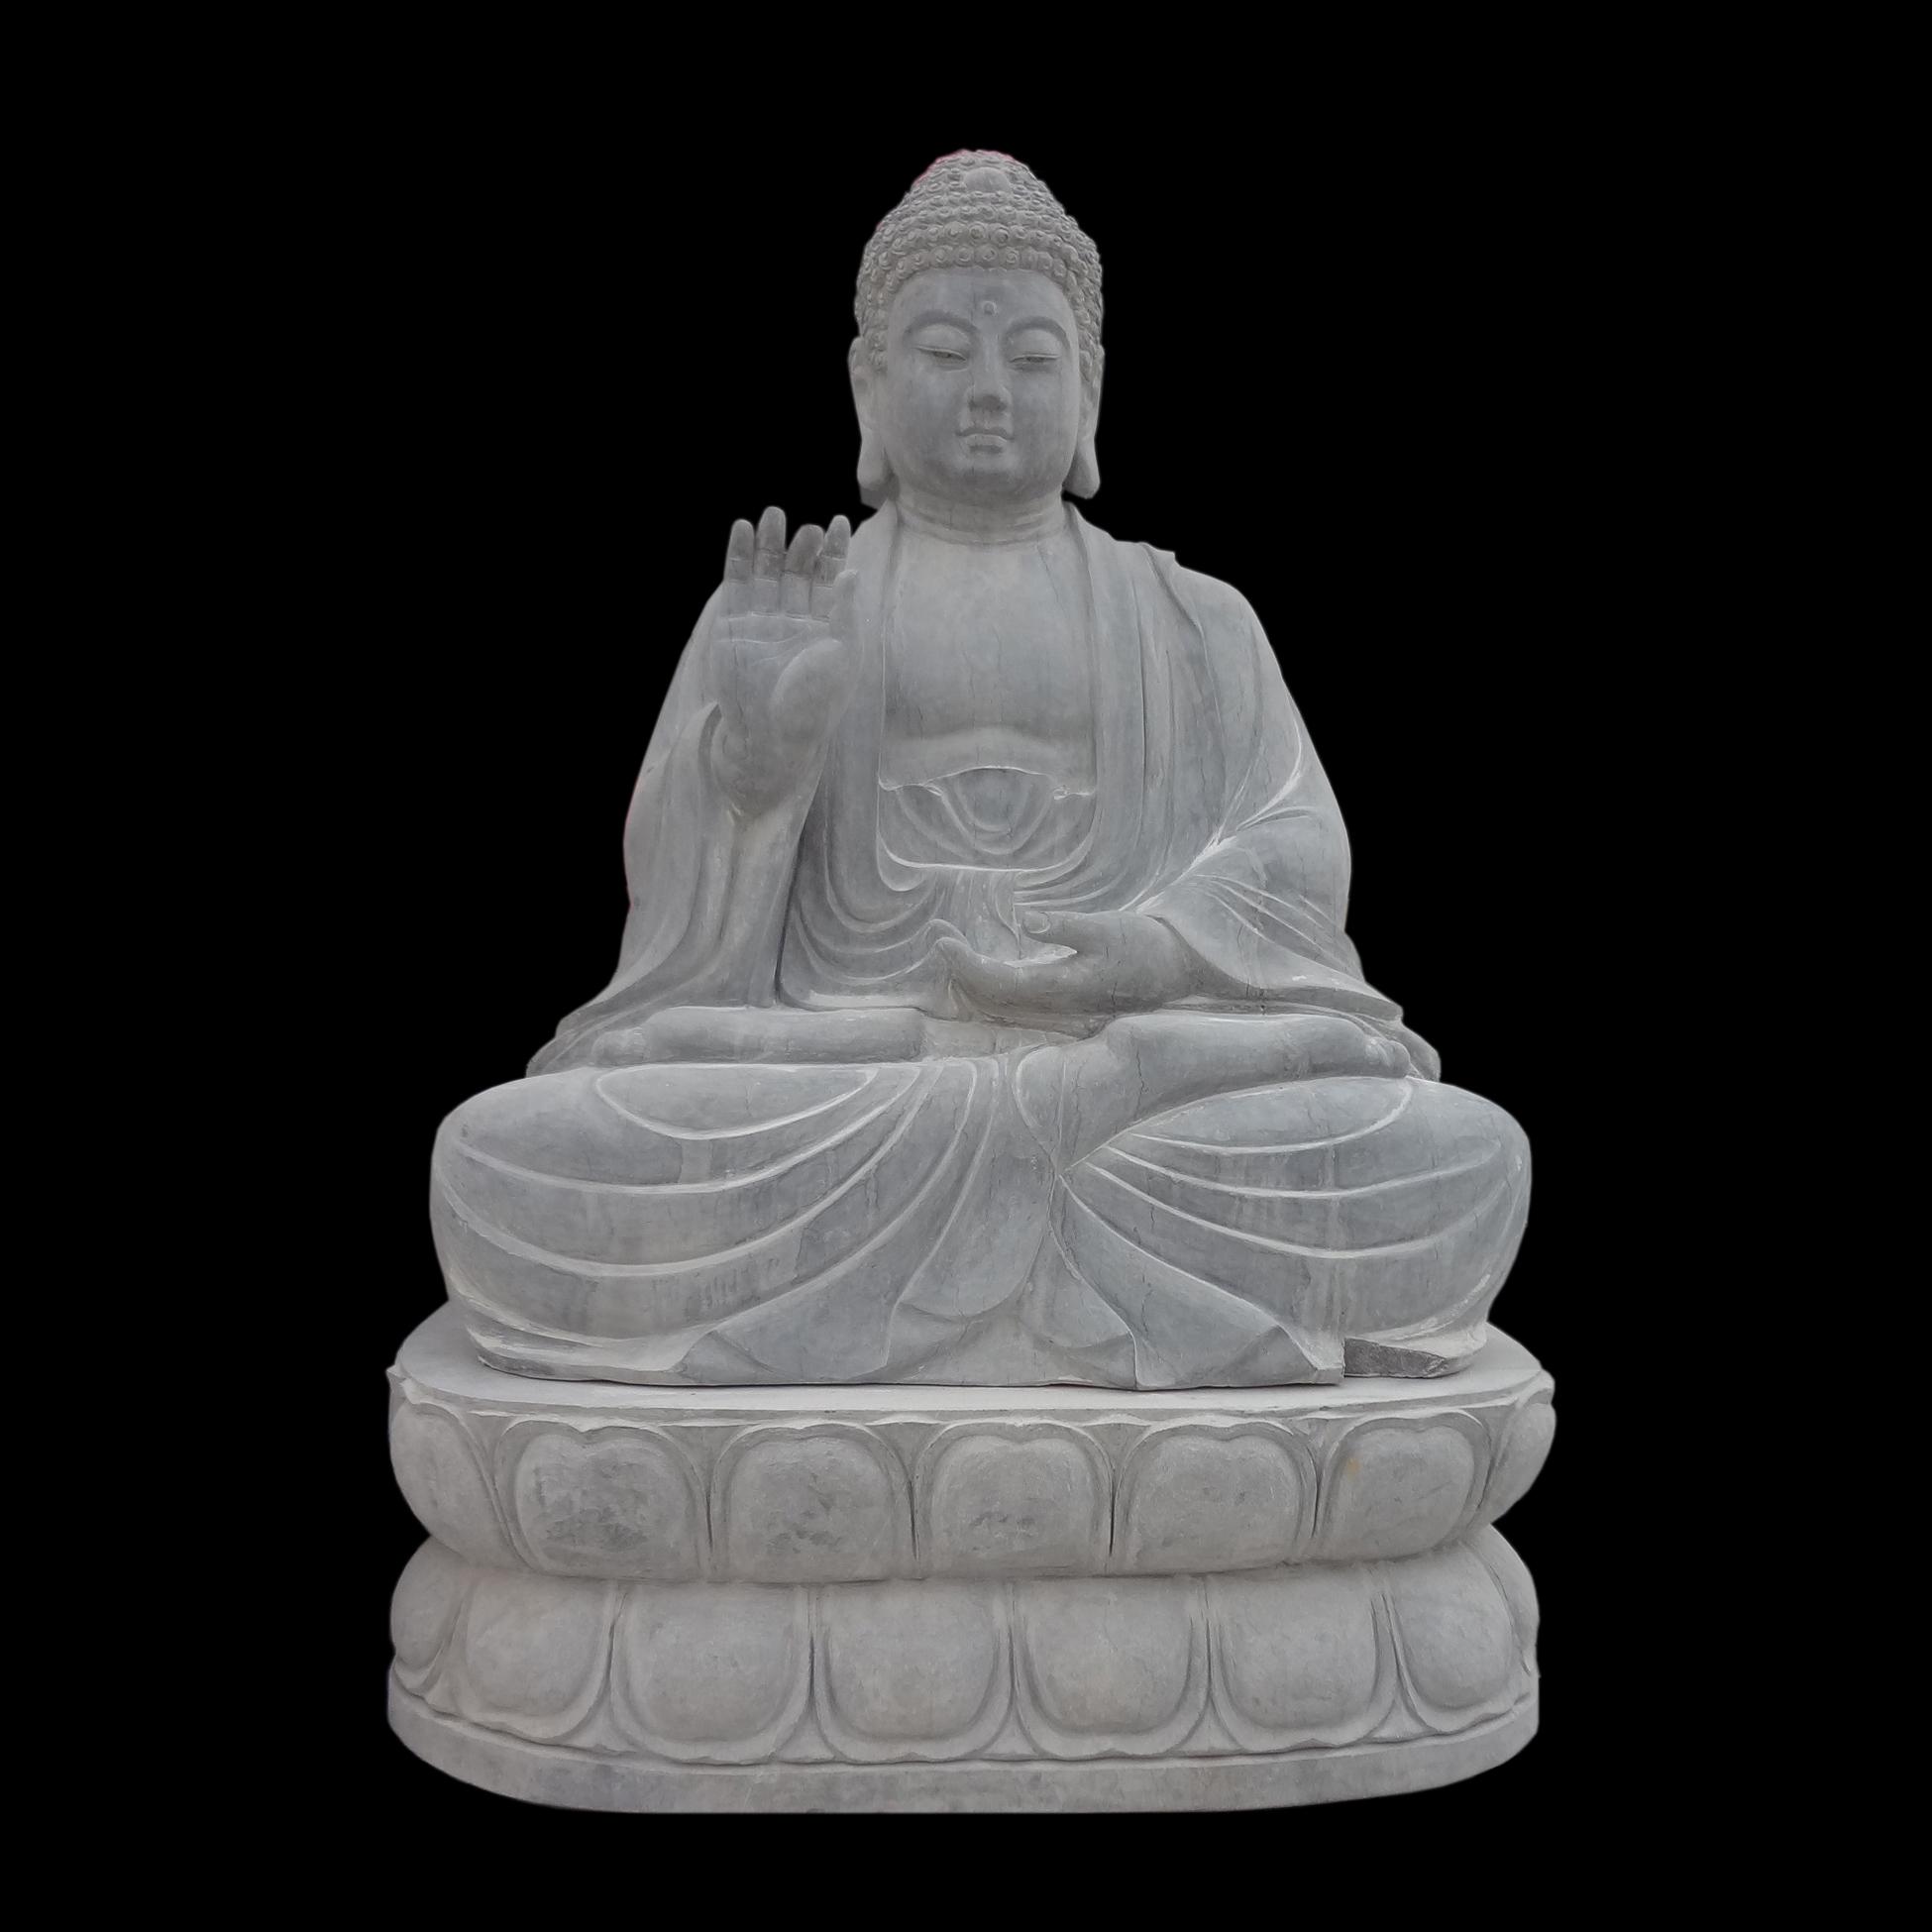 China Buddha Stone Sculpture China Buddha Stone Sculpture